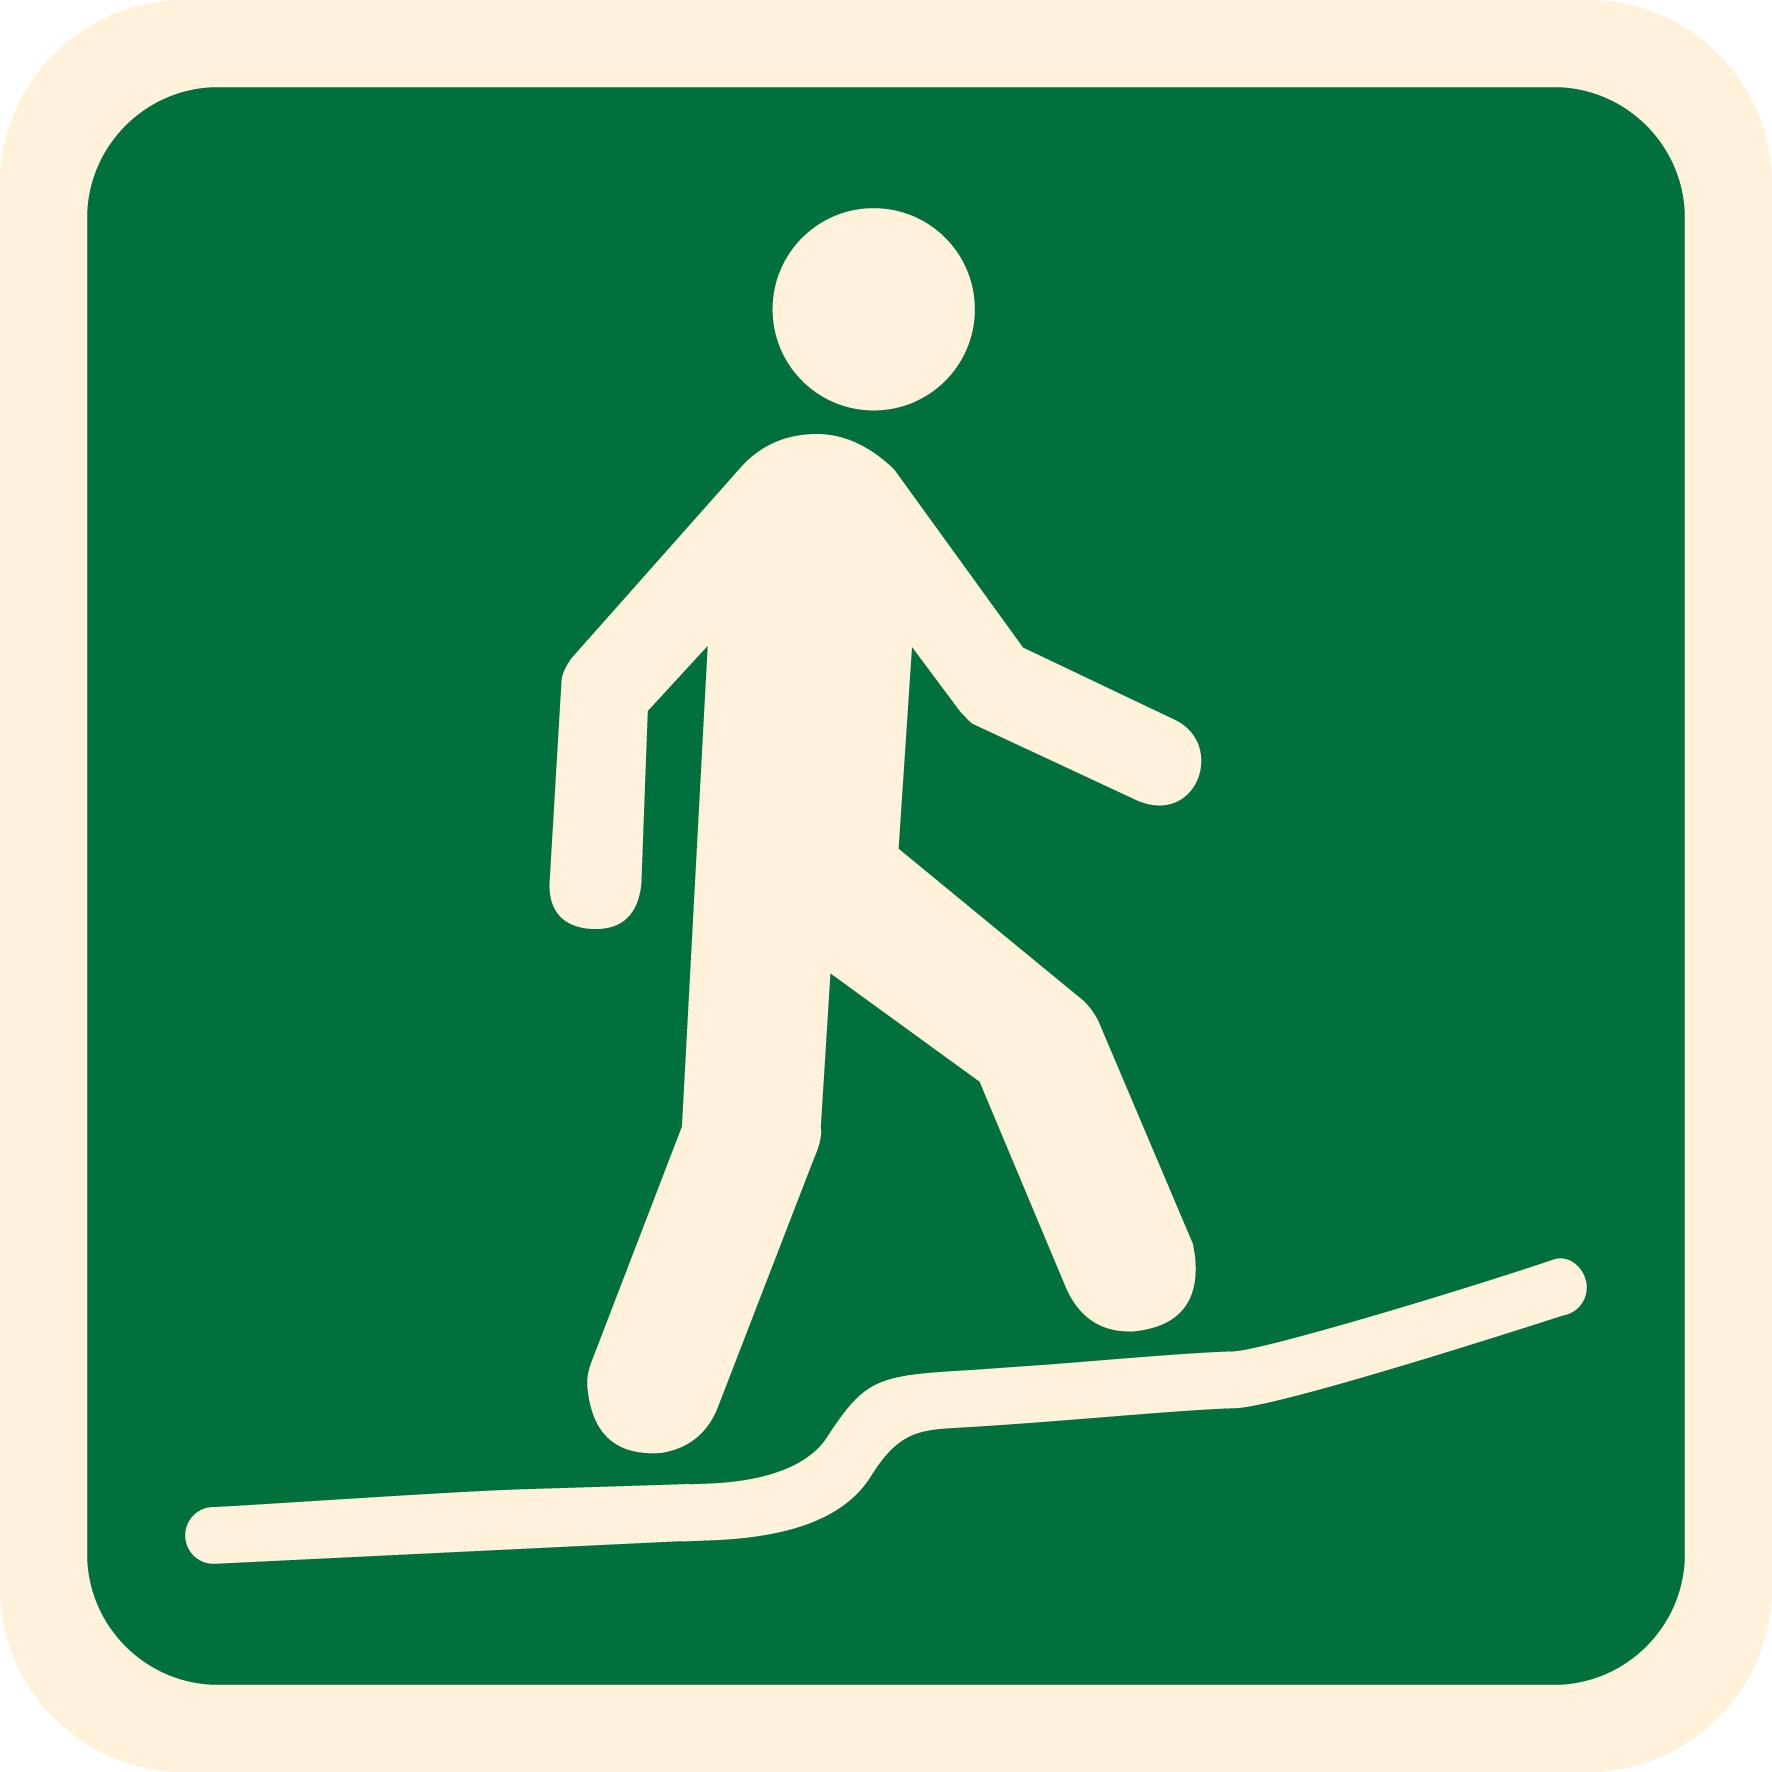 Walk Symbol - ClipArt Best